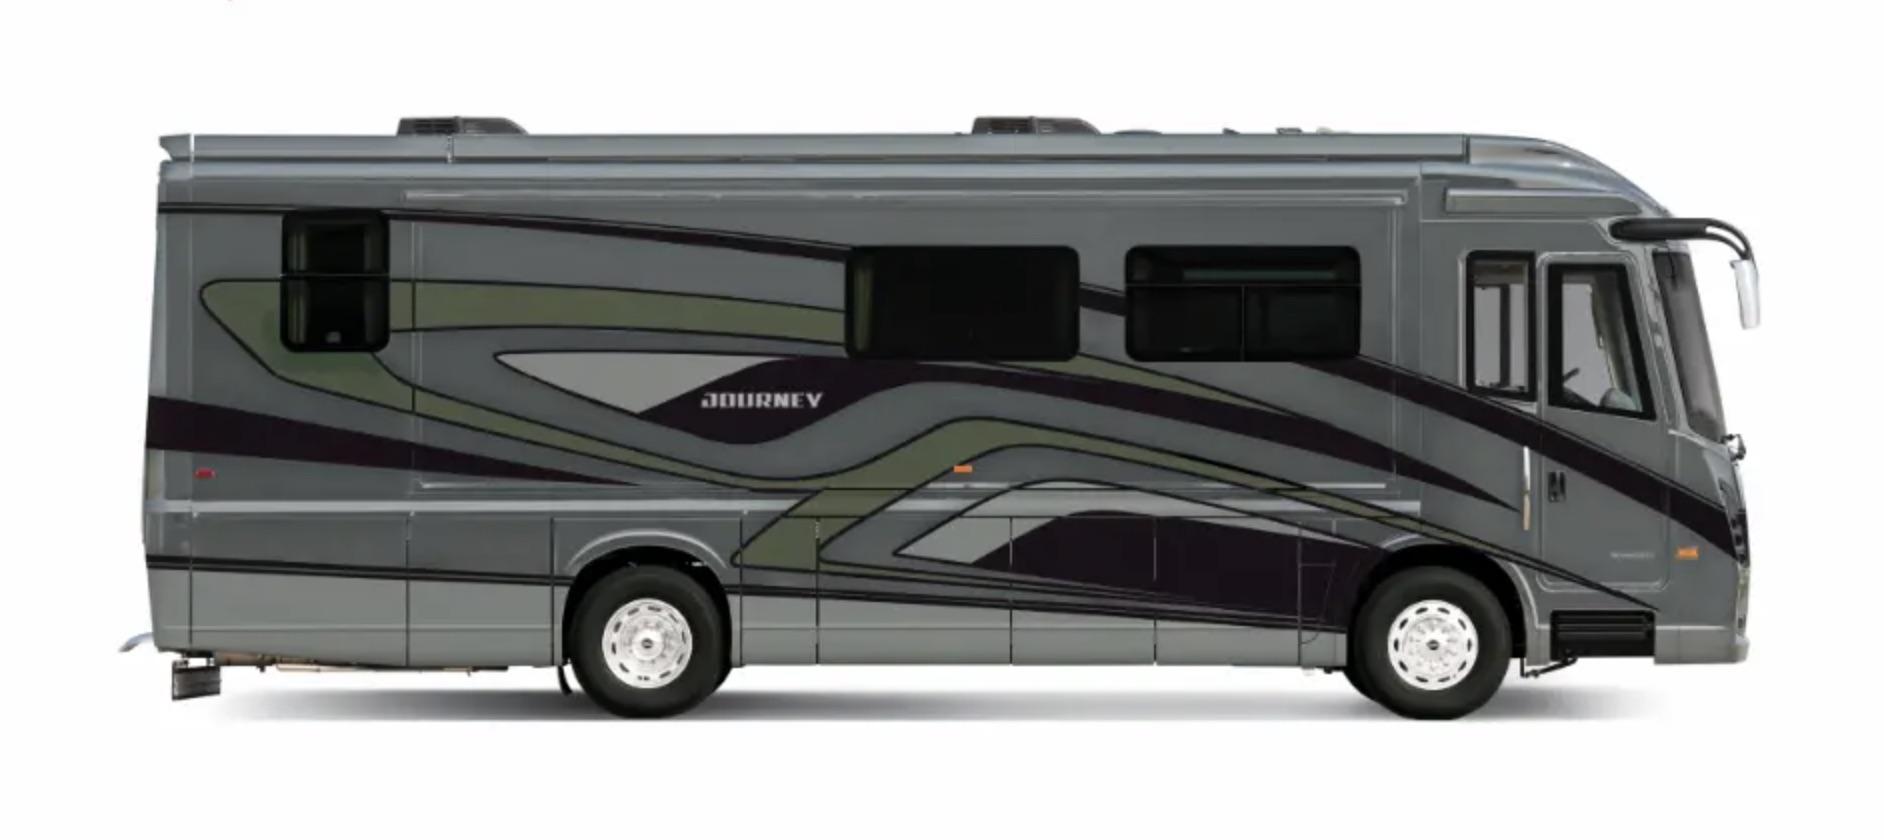 2021 Winnebago Journey exterior